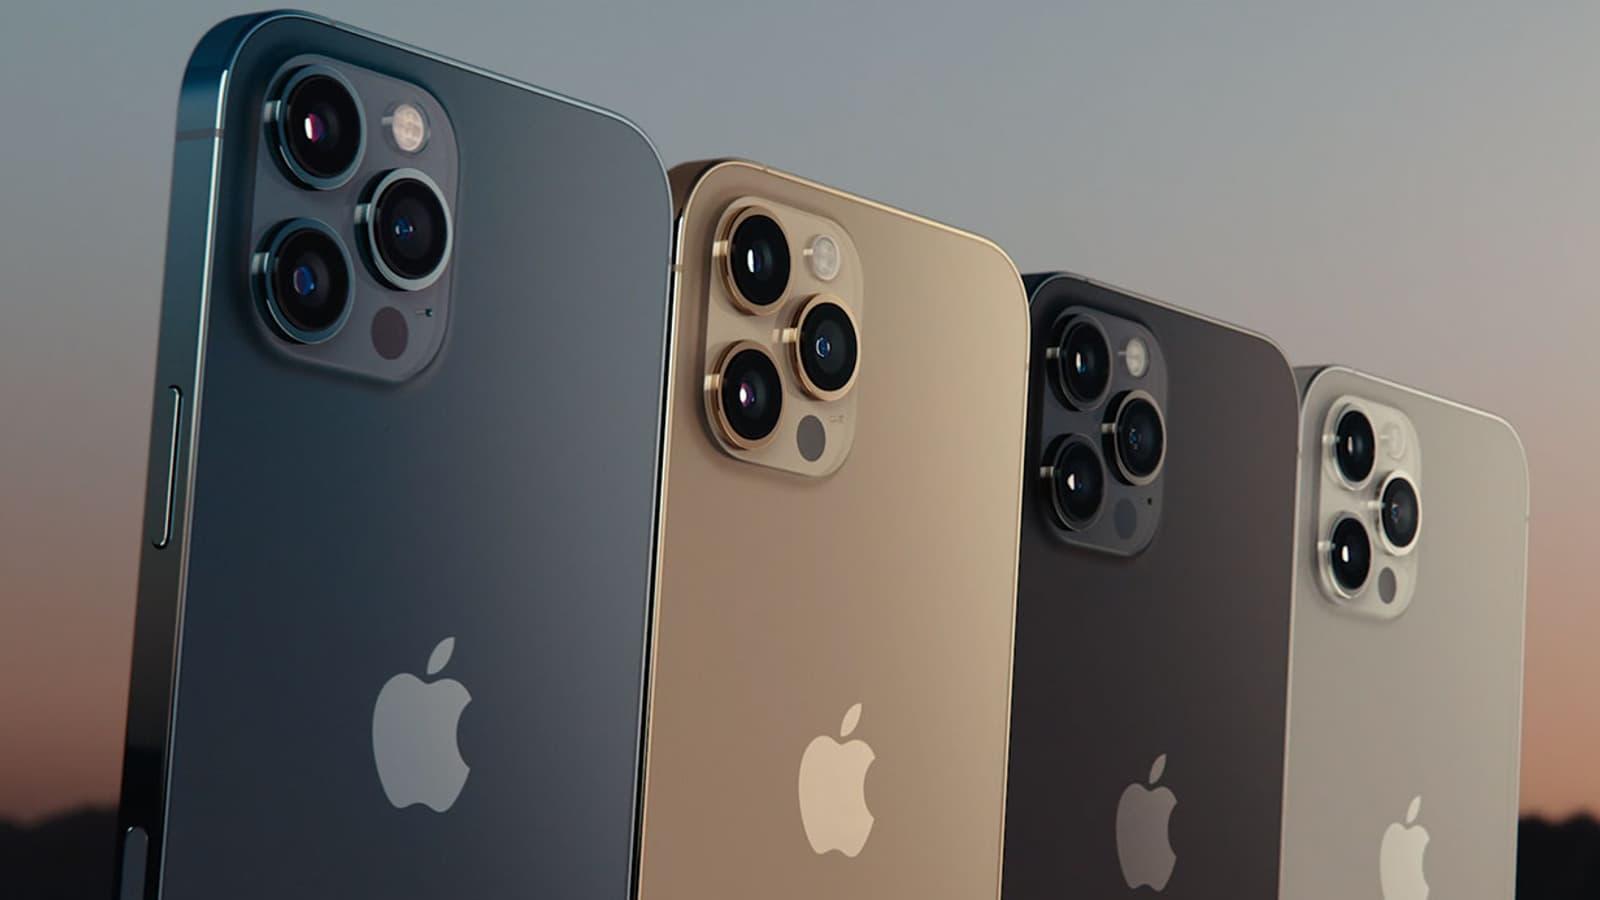 iPhone 12, iPhone 12 Pro: Apple dévoile ses premiers iPhone 5G